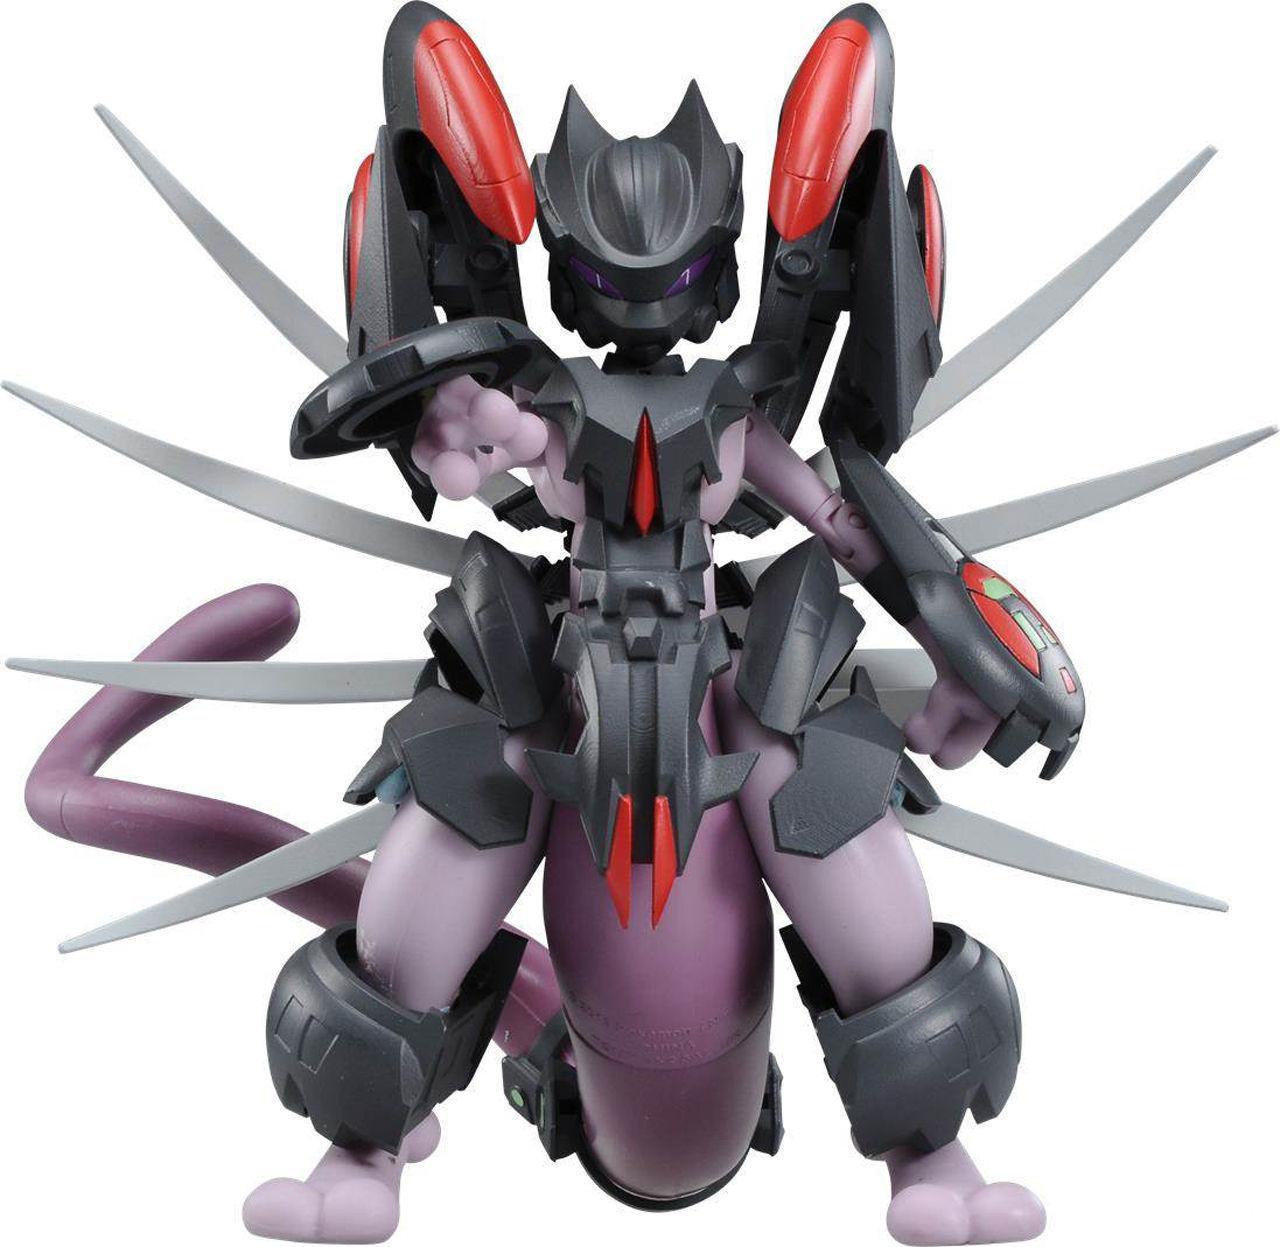 Takara Tomy shows your figure of Mewtwo Battleship